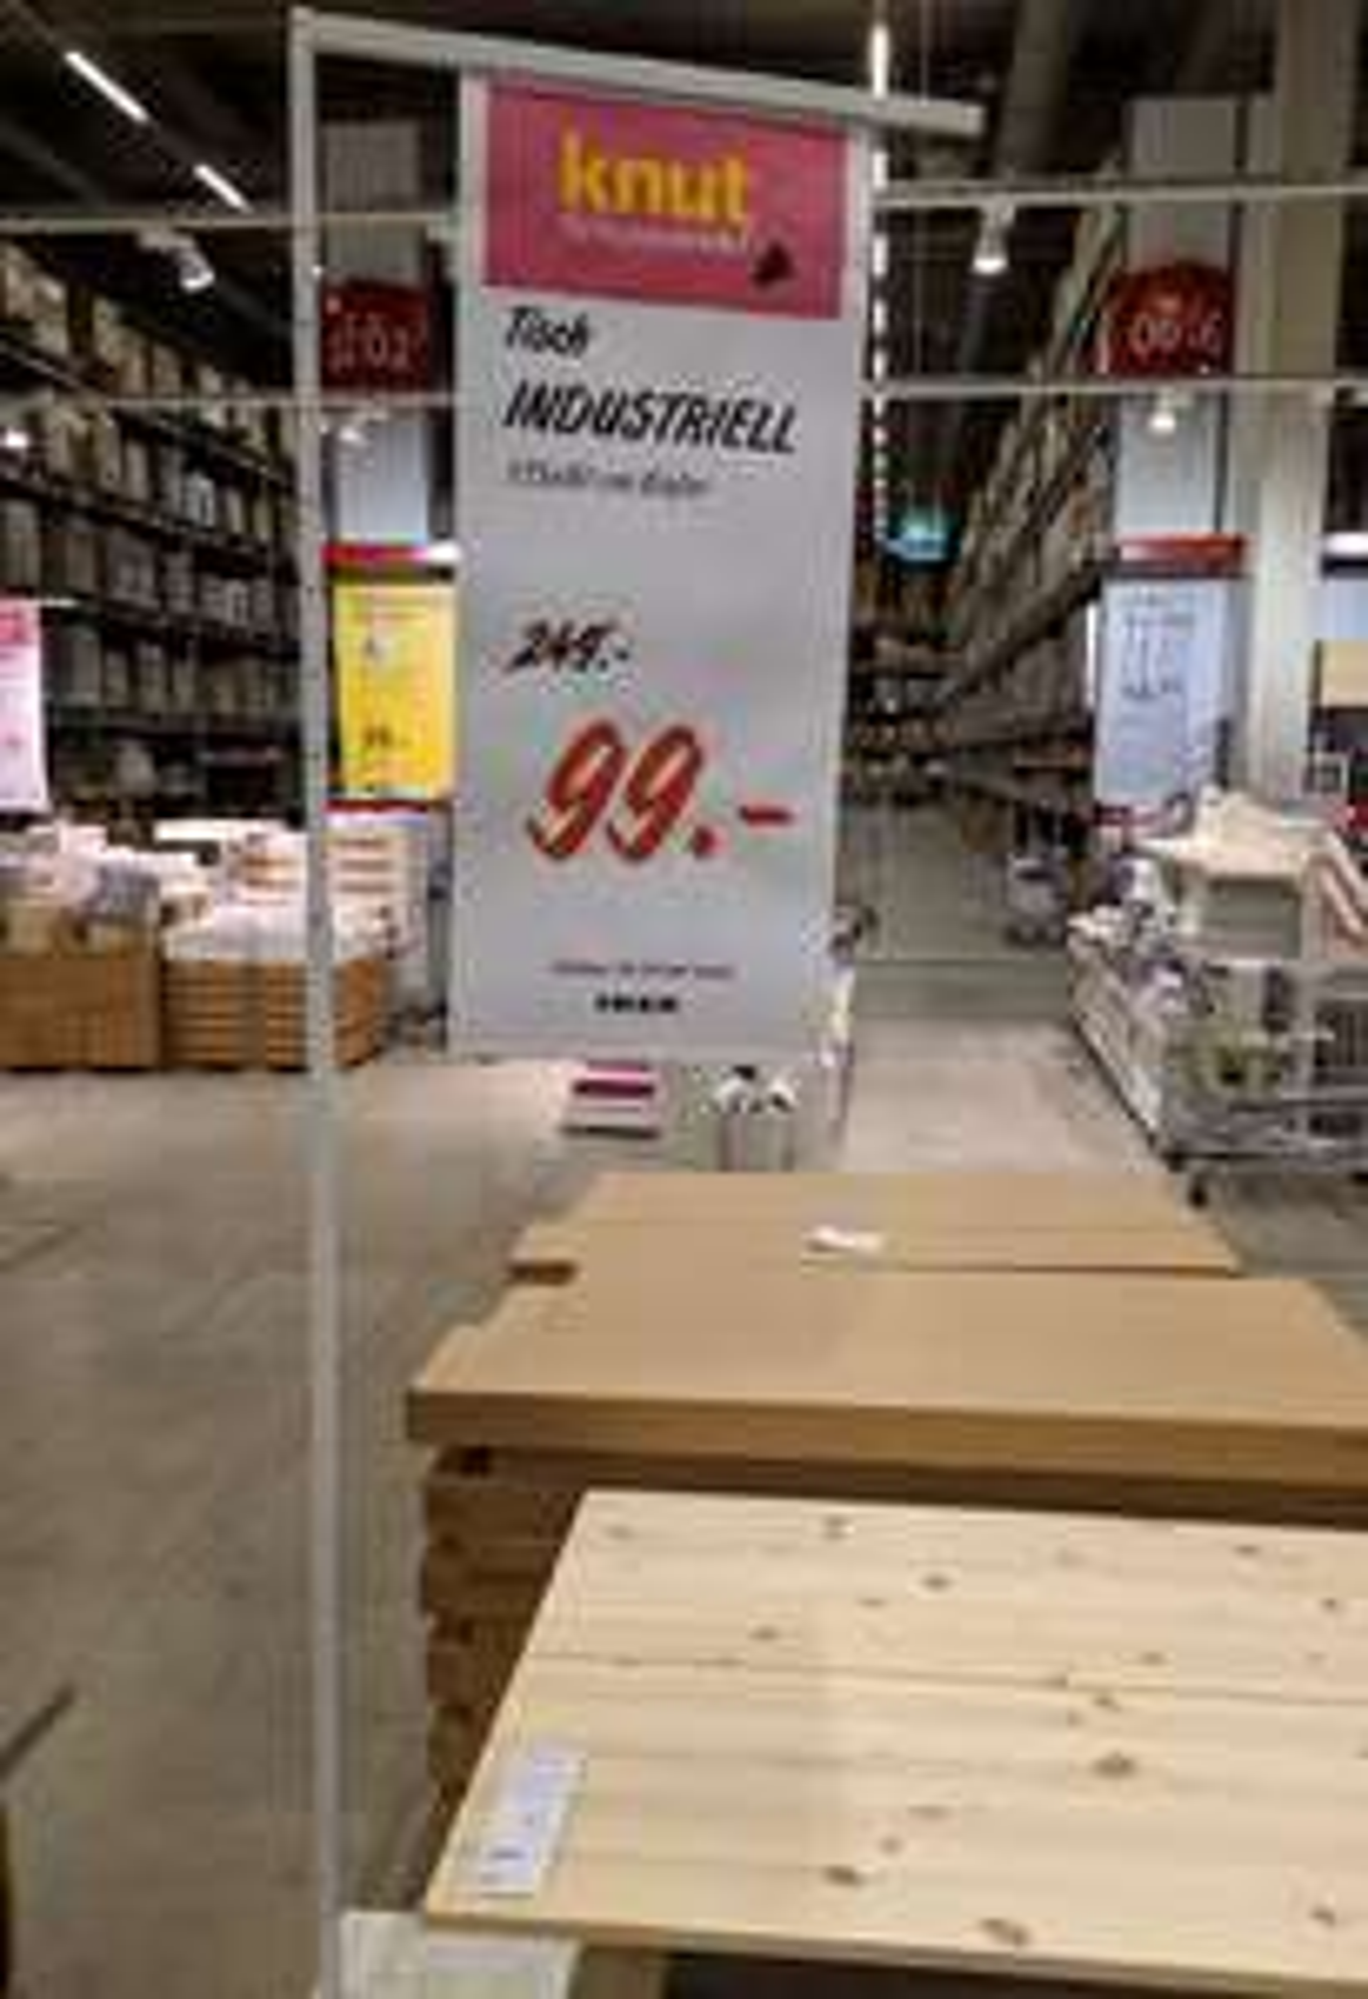 Ikea Tisch Industriell 135x80 [Ikea Hannover Expo Park]